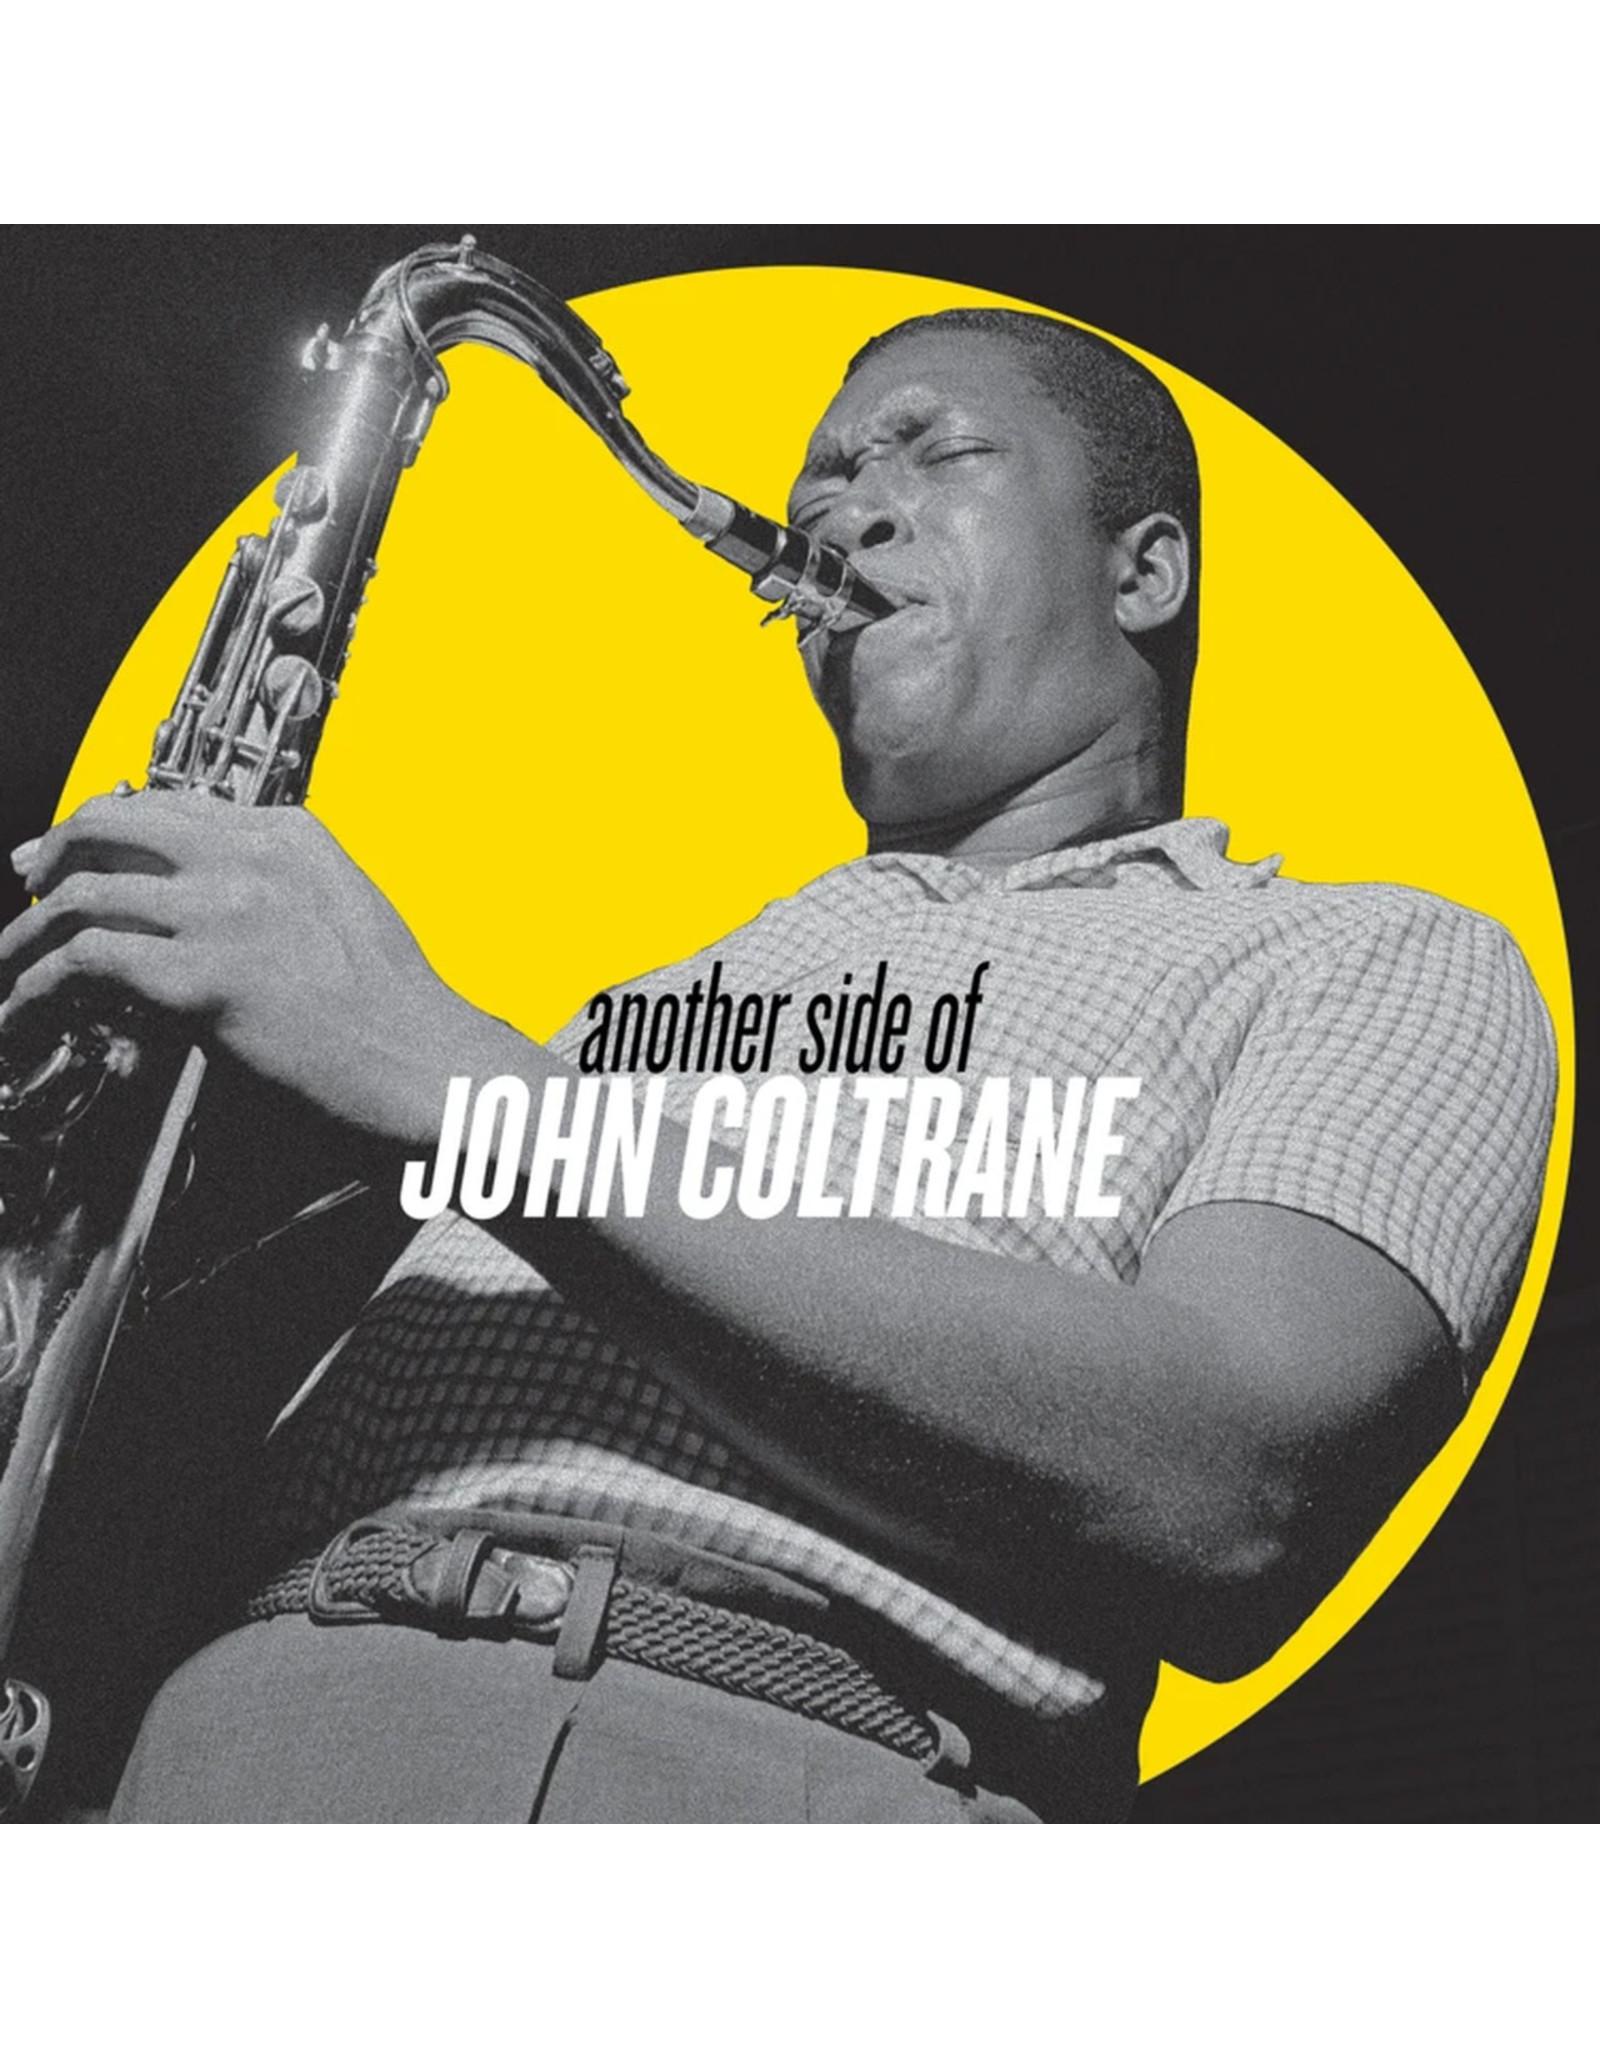 Coltrane, John - Another Side Of John Coltrane 2LP